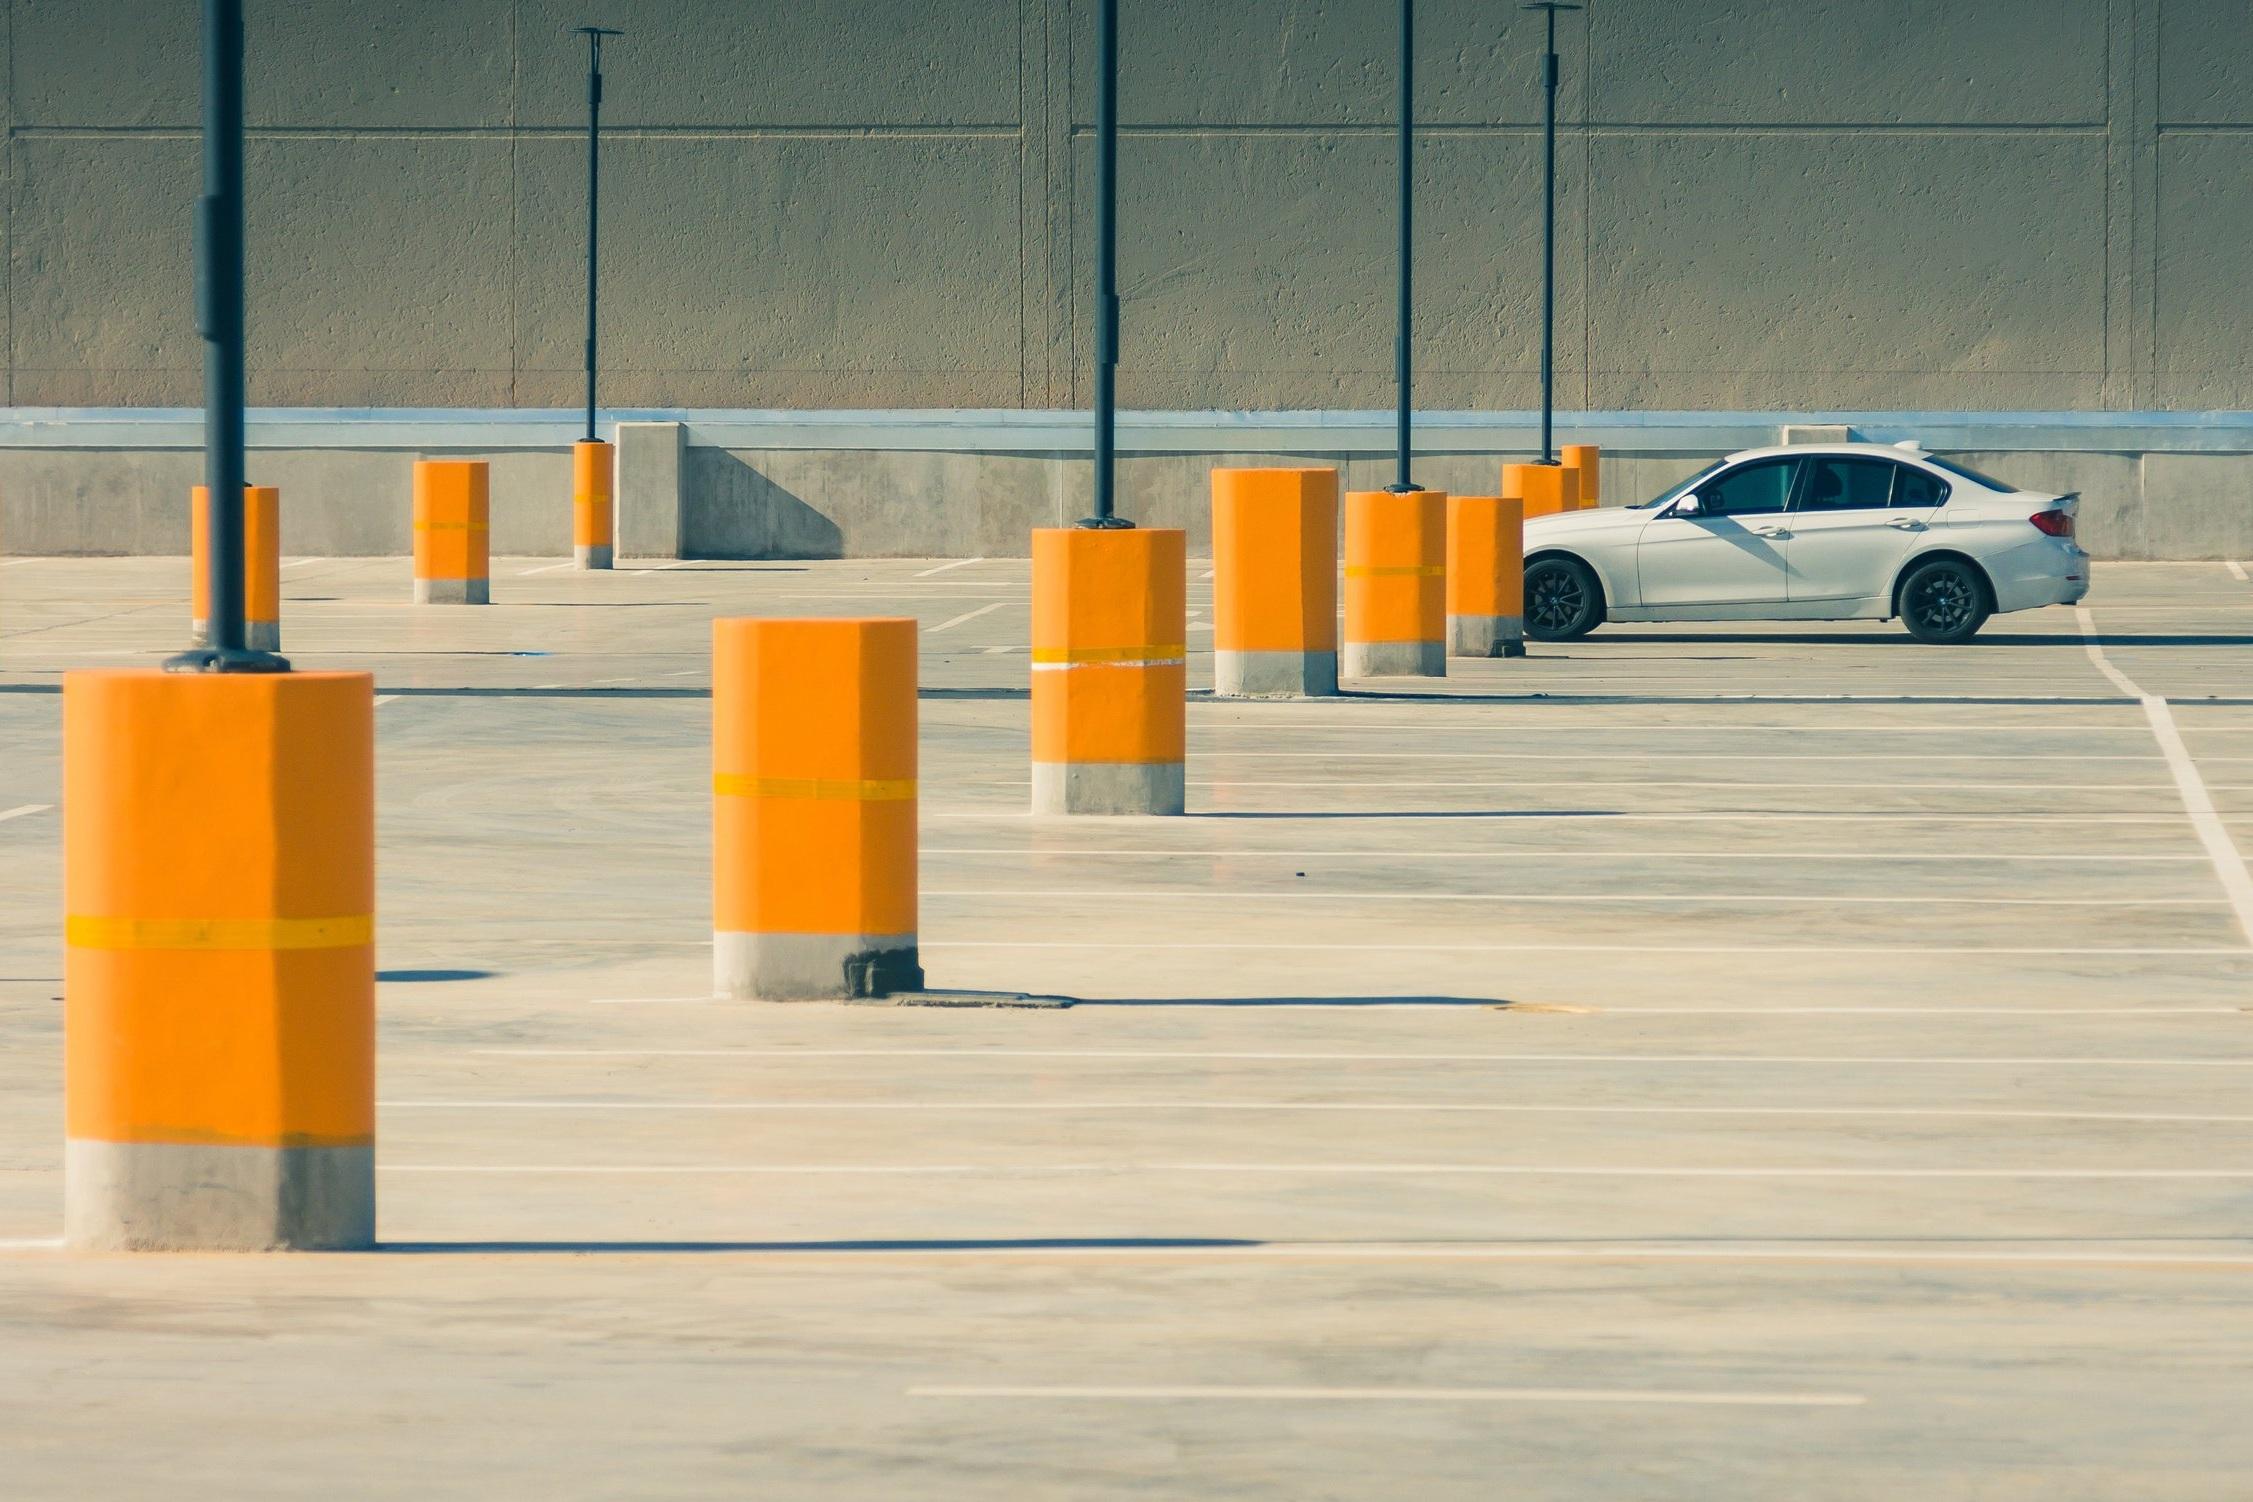 Valet Services & Parking Management -